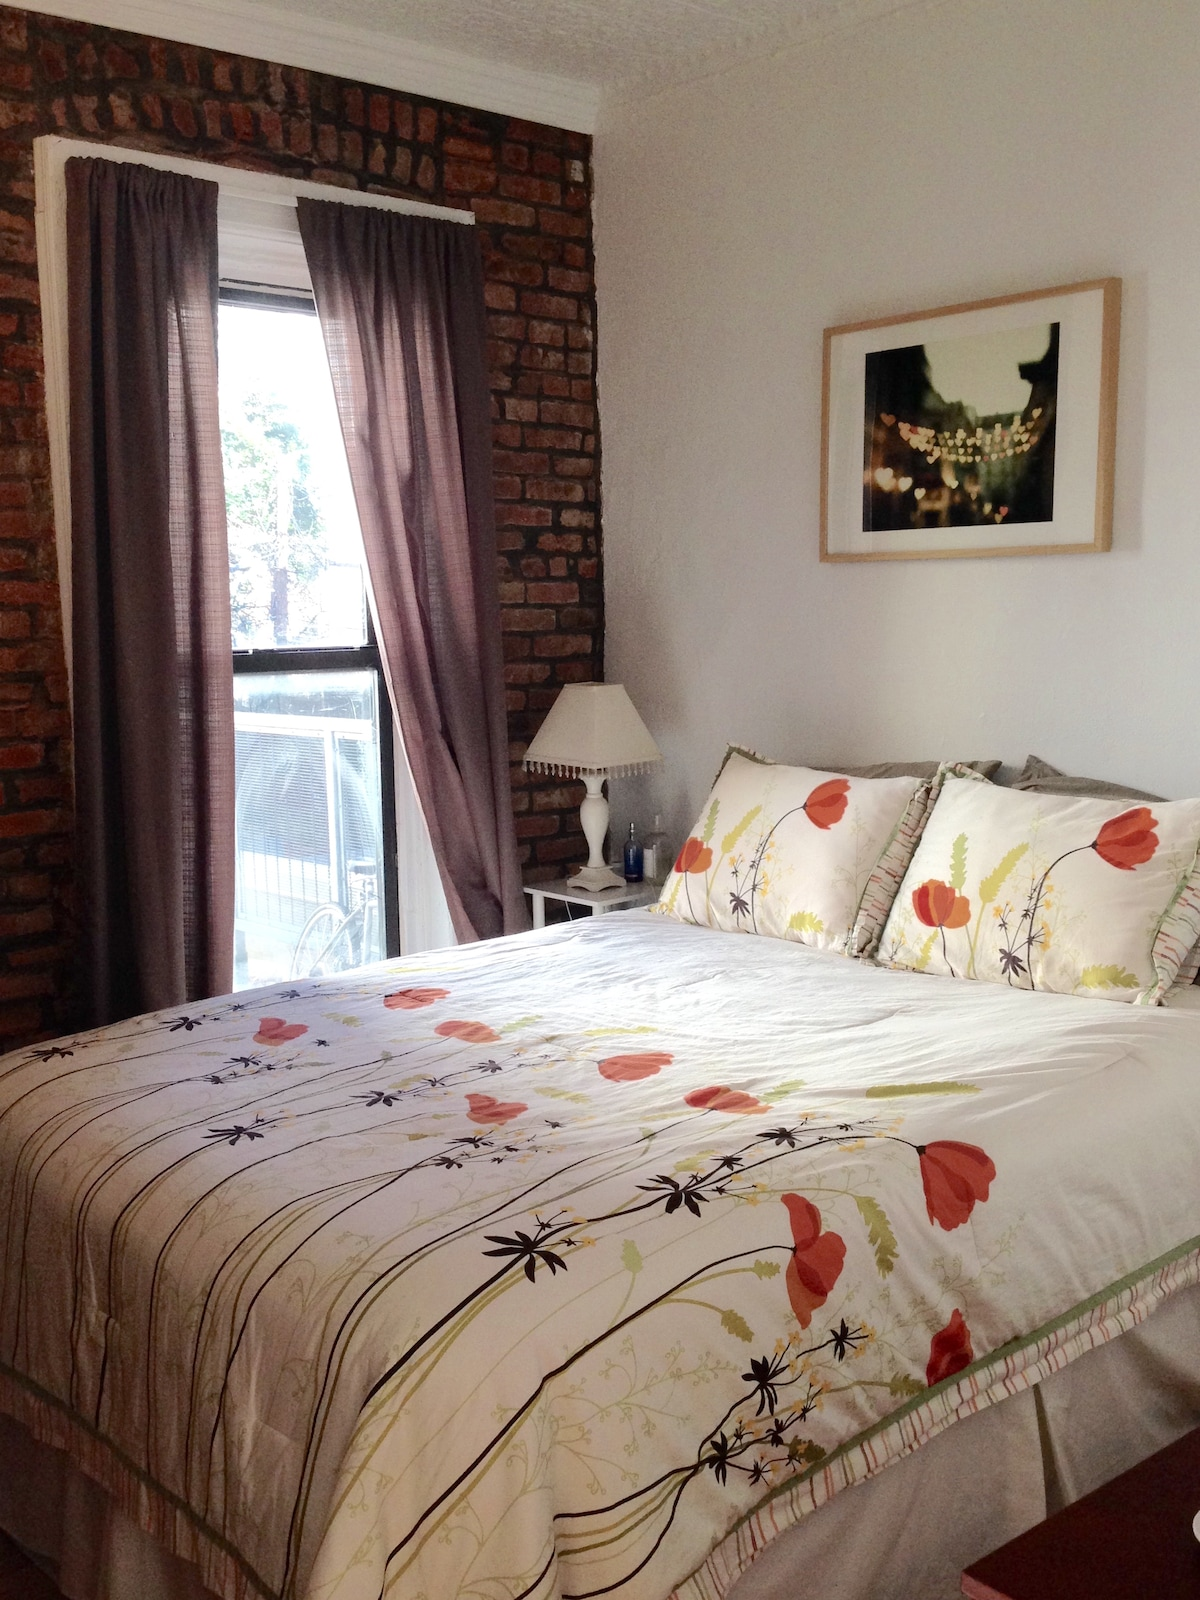 1-bedroom in charming Park Slope